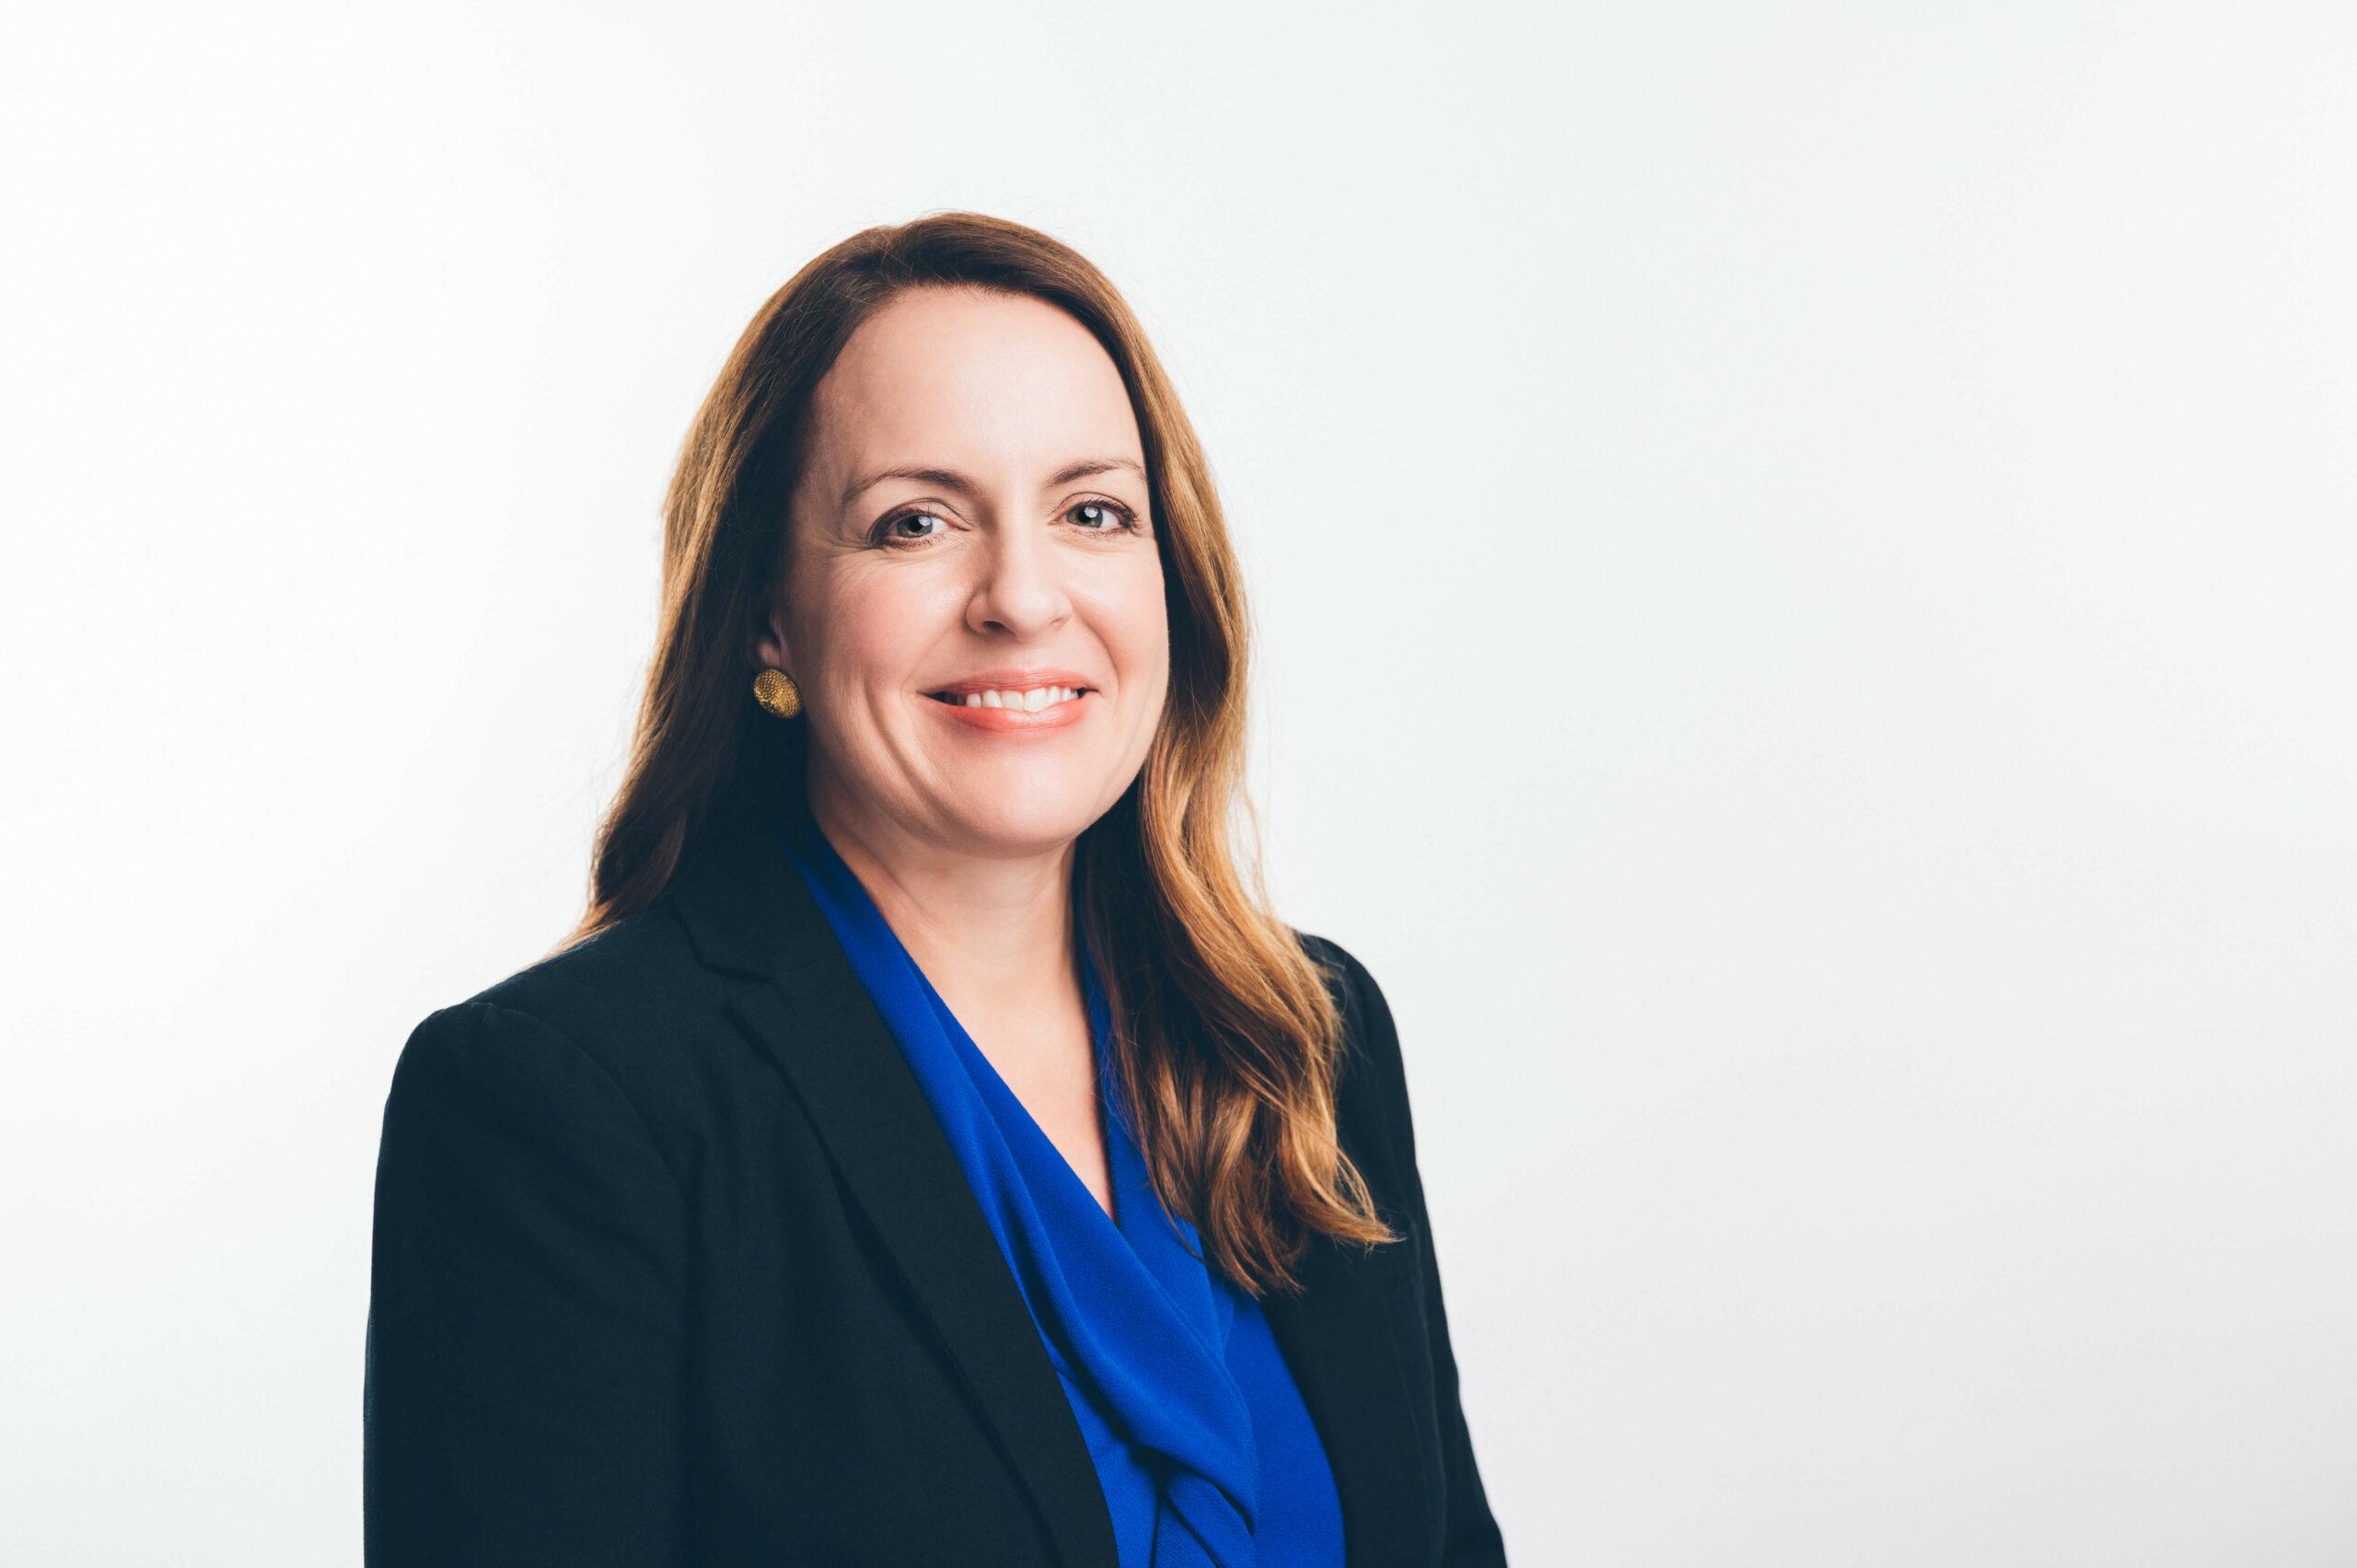 TSC ANNOUNCES EUAN MURRAY STEPPING DOWN AS CEO; DR. CHRISTY SLAY NAMED AS INTERIM CEO